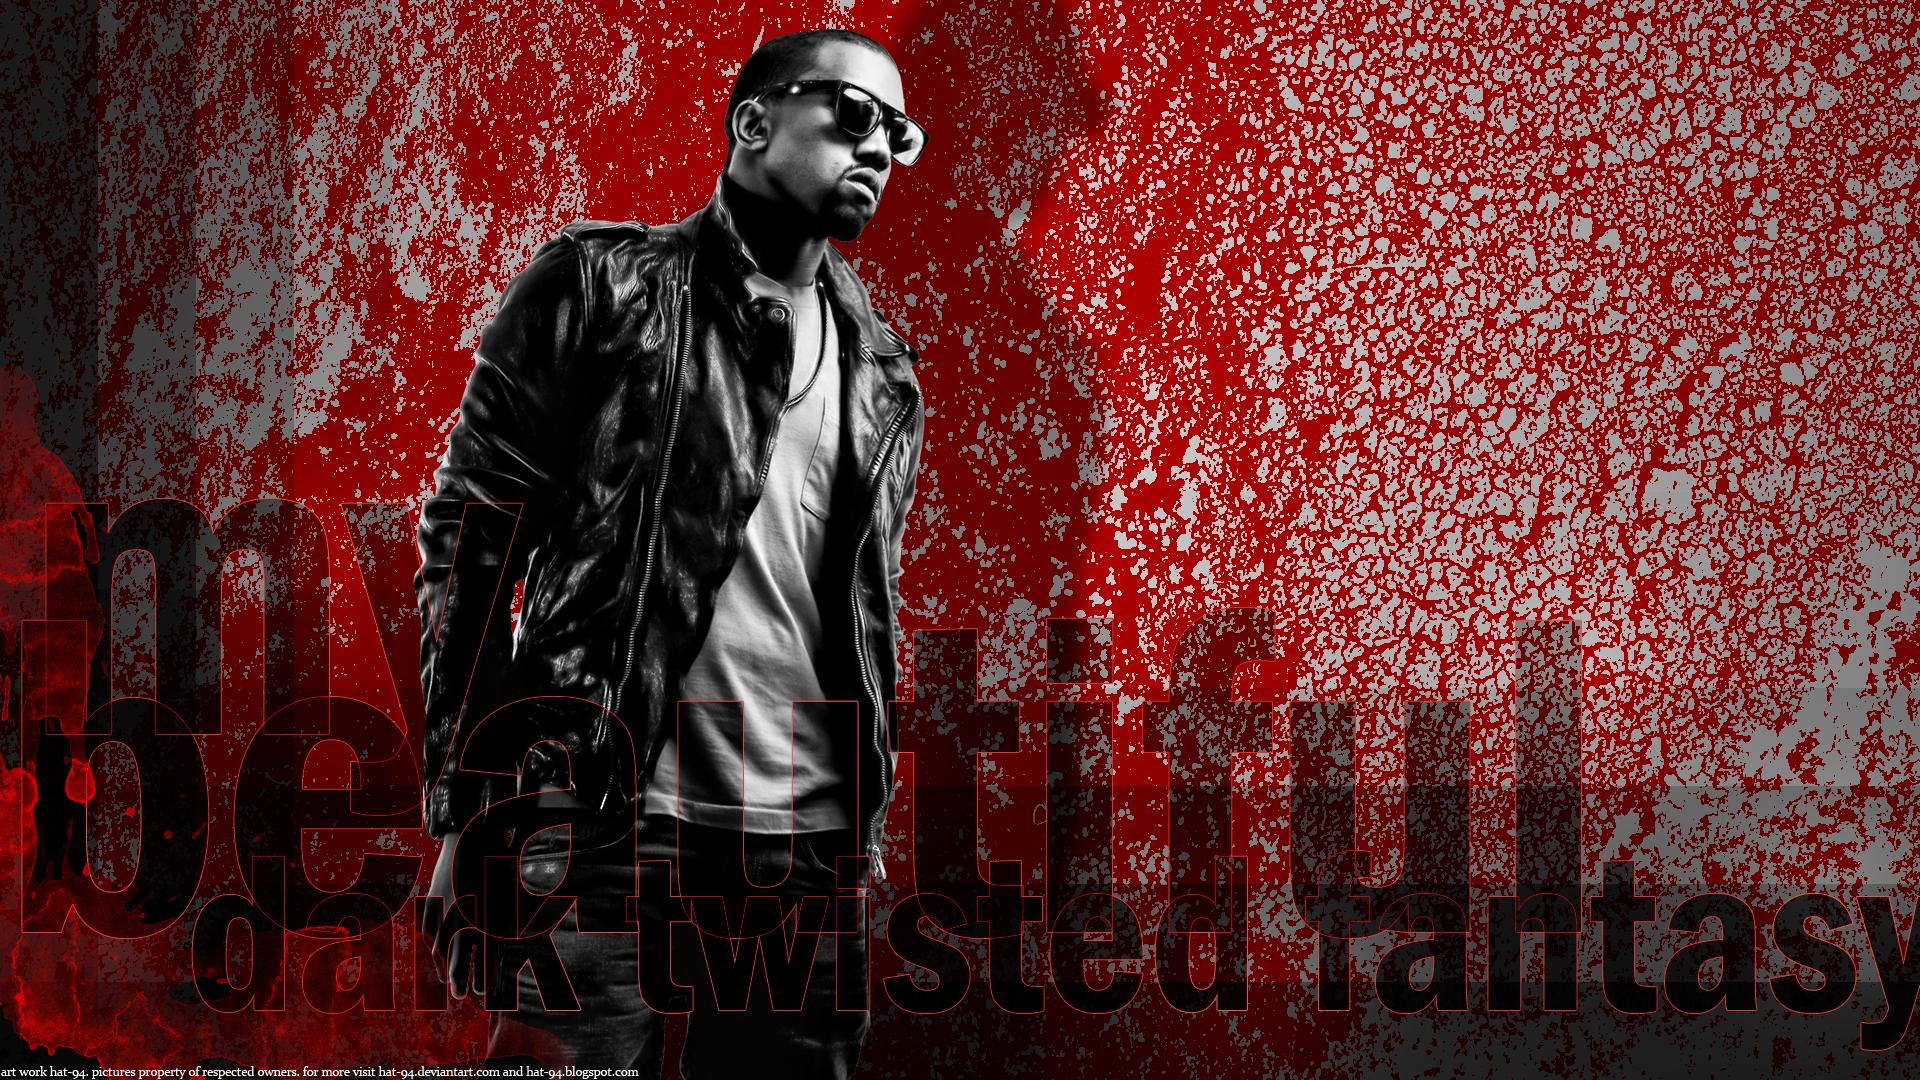 Kanye West Monochrome Wallpaper